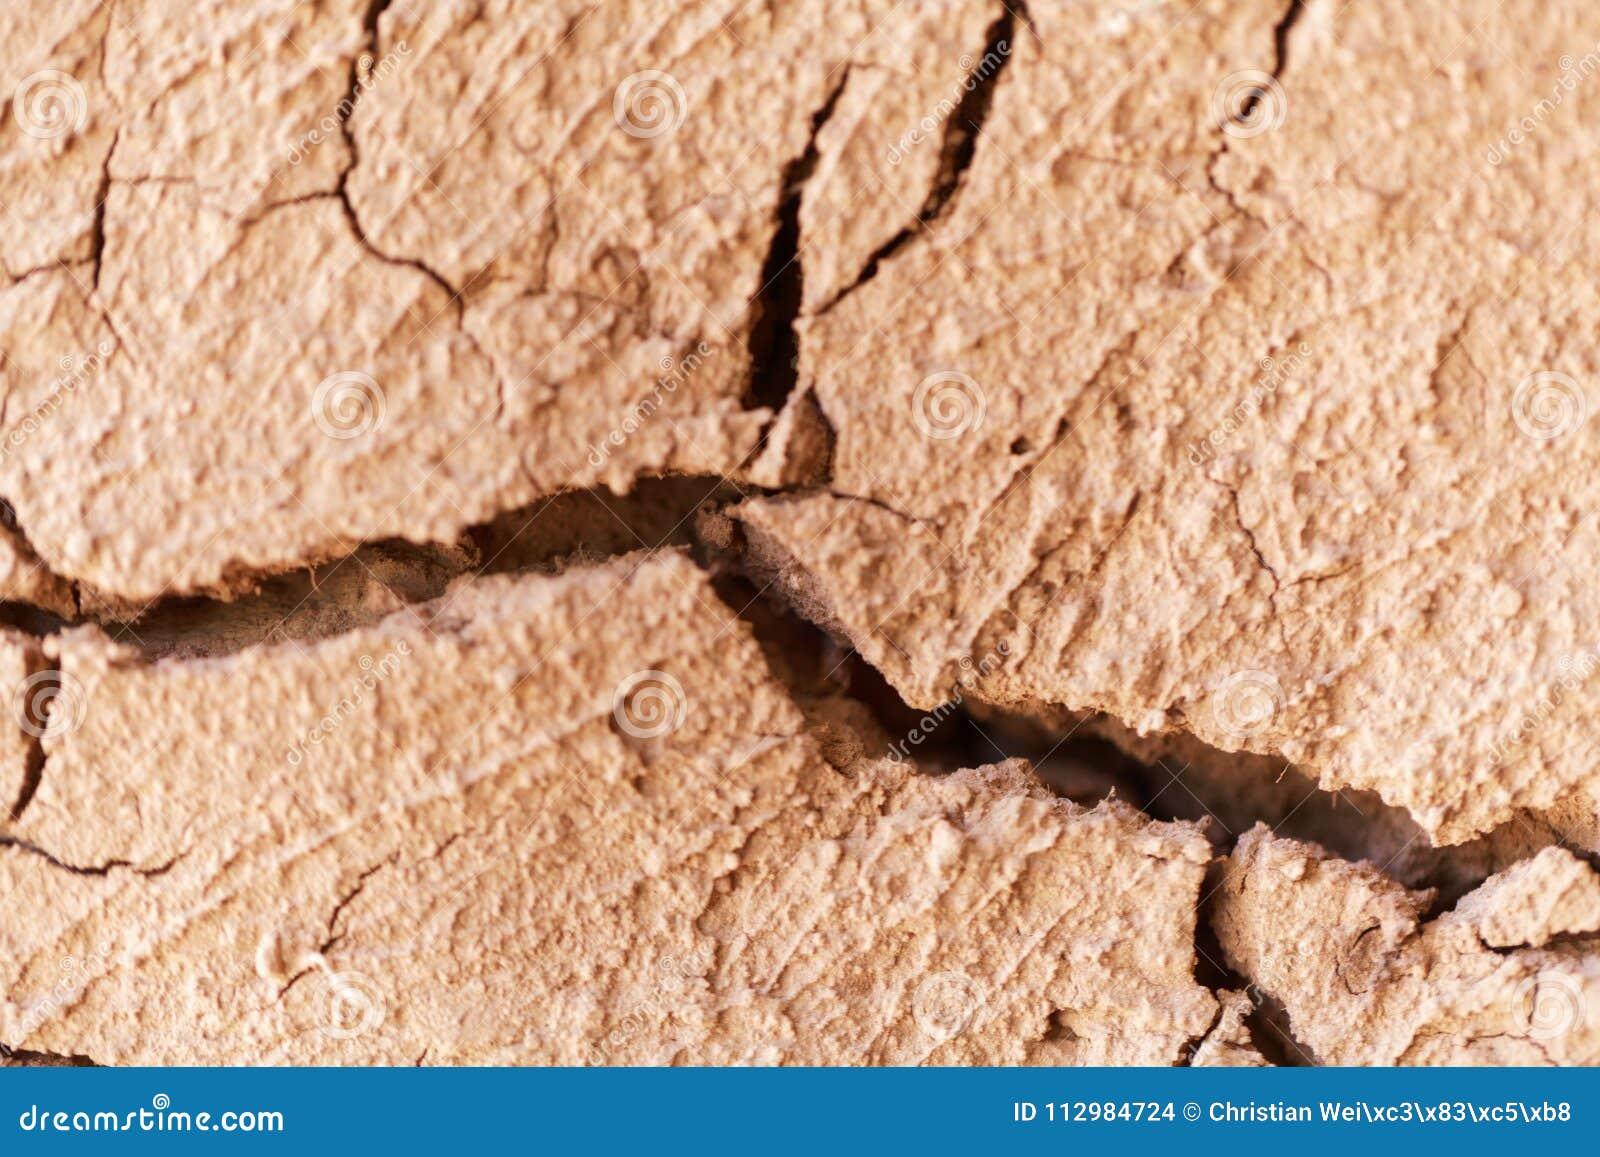 Cracks in old mud mortar.